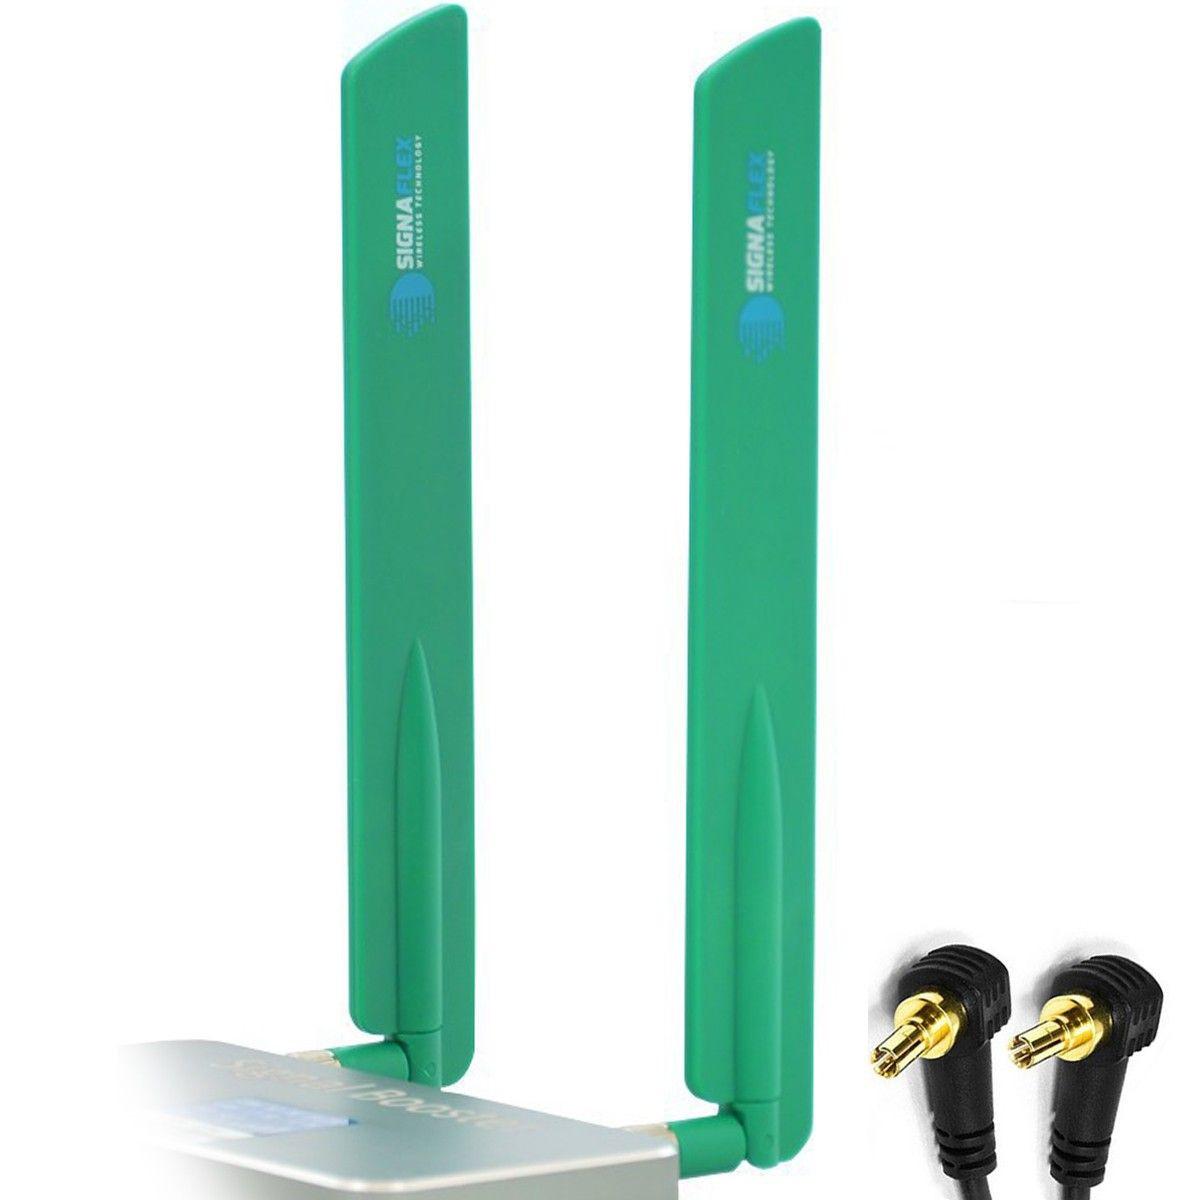 Antena bat 4G LTE GREEN 13dbi +CRC9 x 2szt